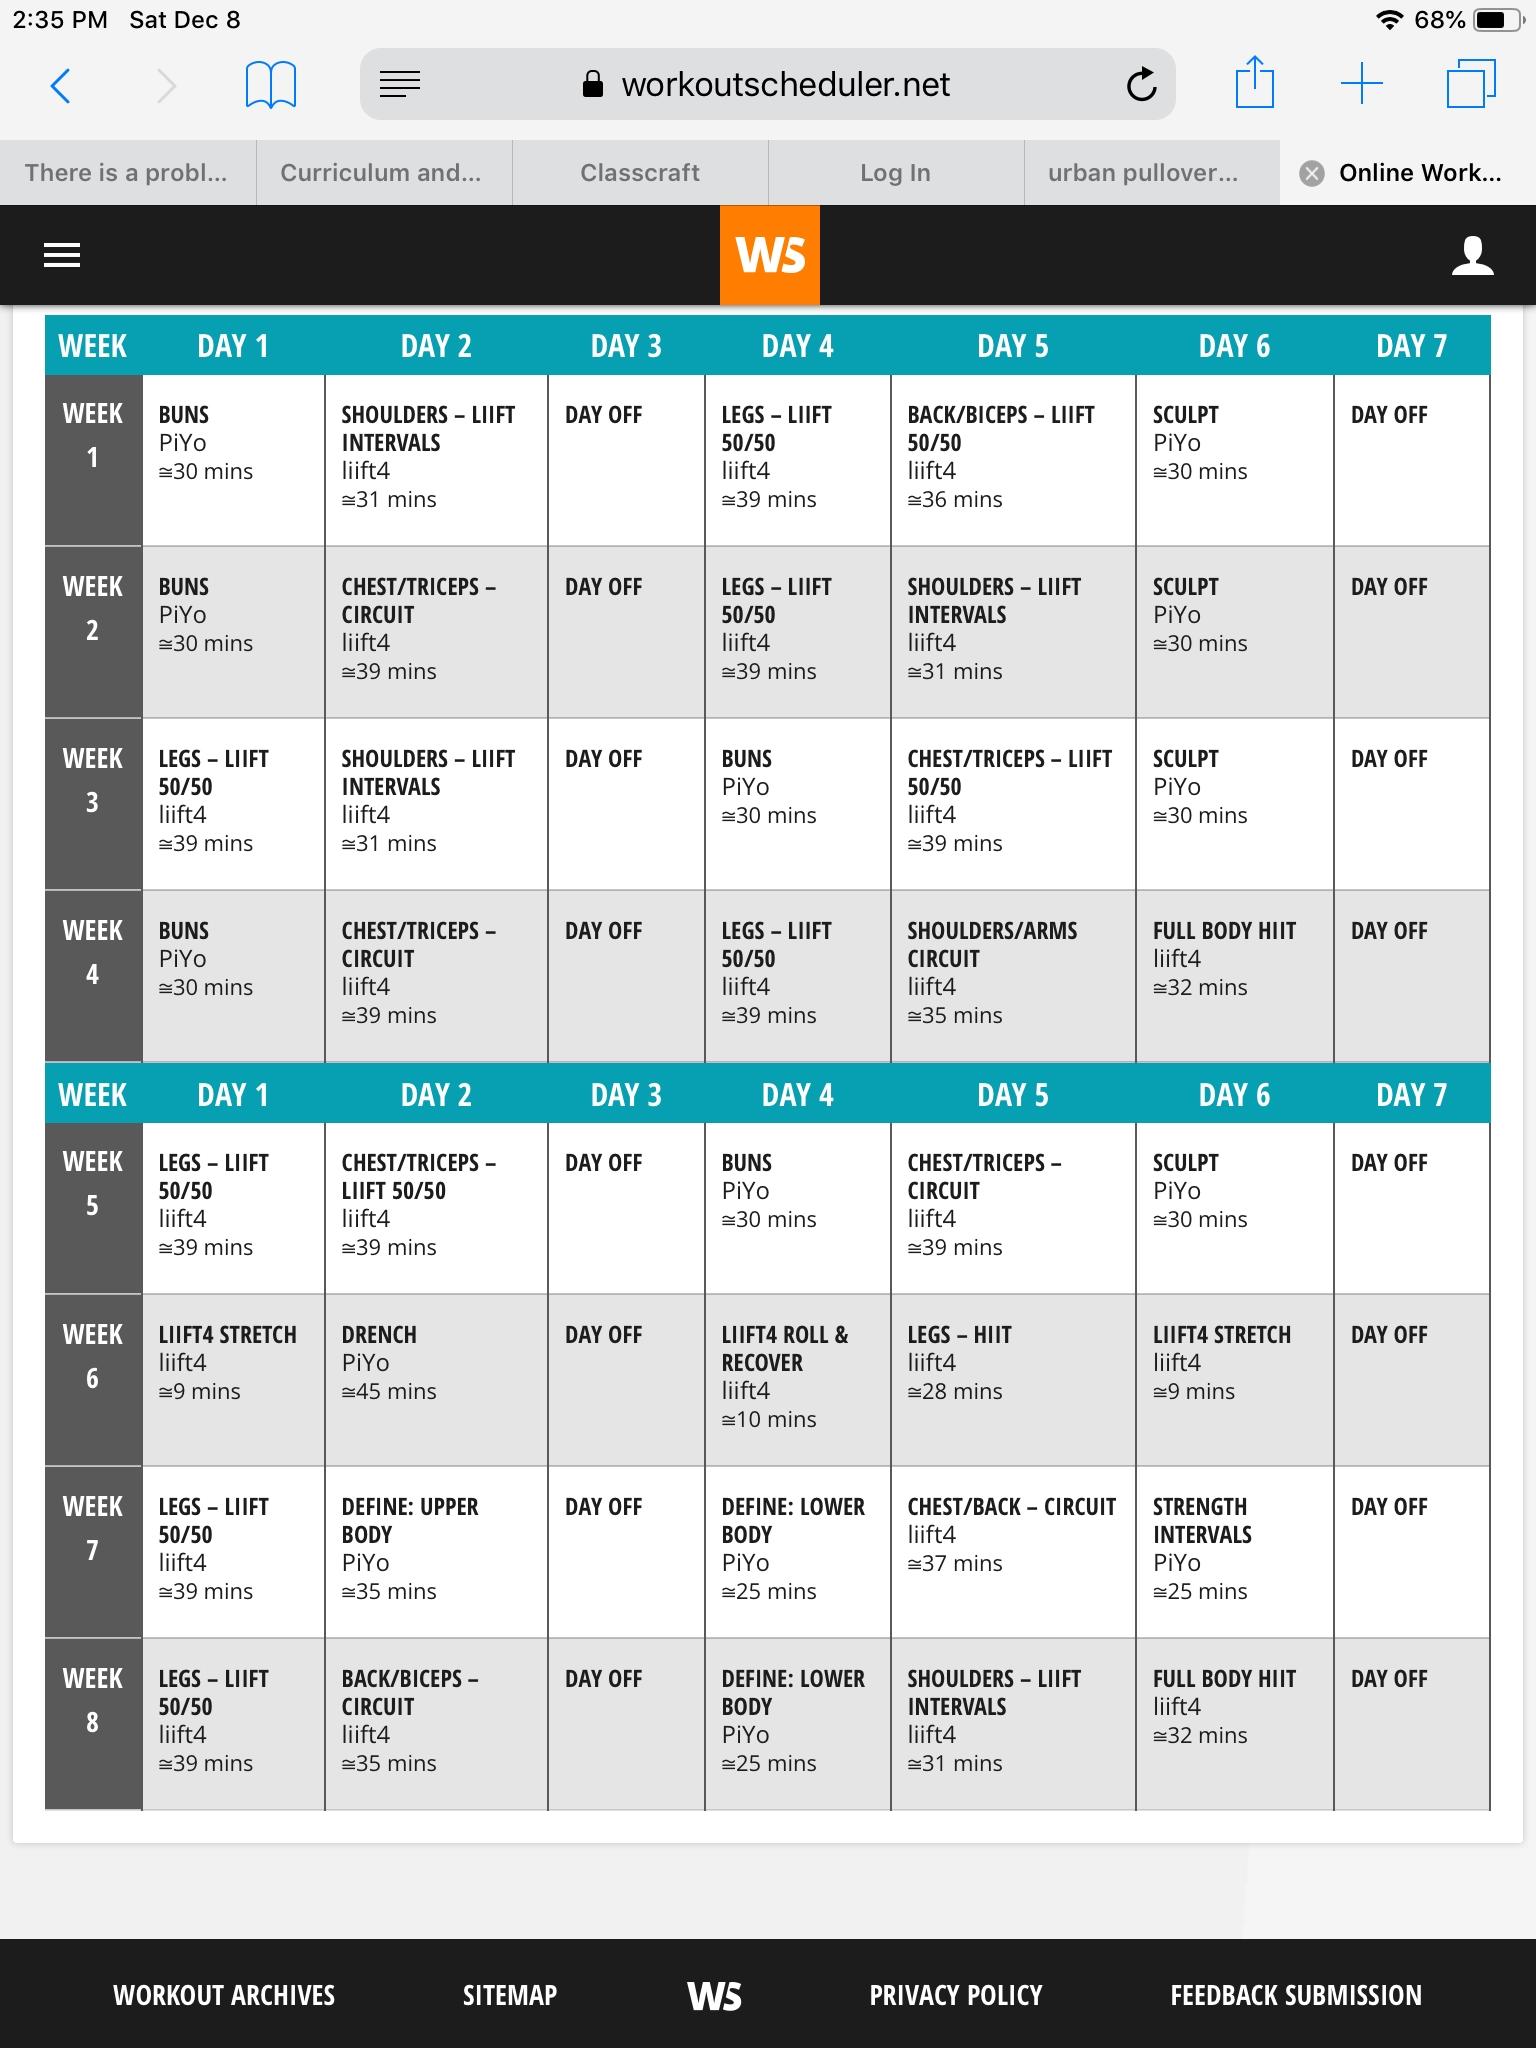 Liift4 And Piyo Hybrid Workout | Workout Calendar, Workout